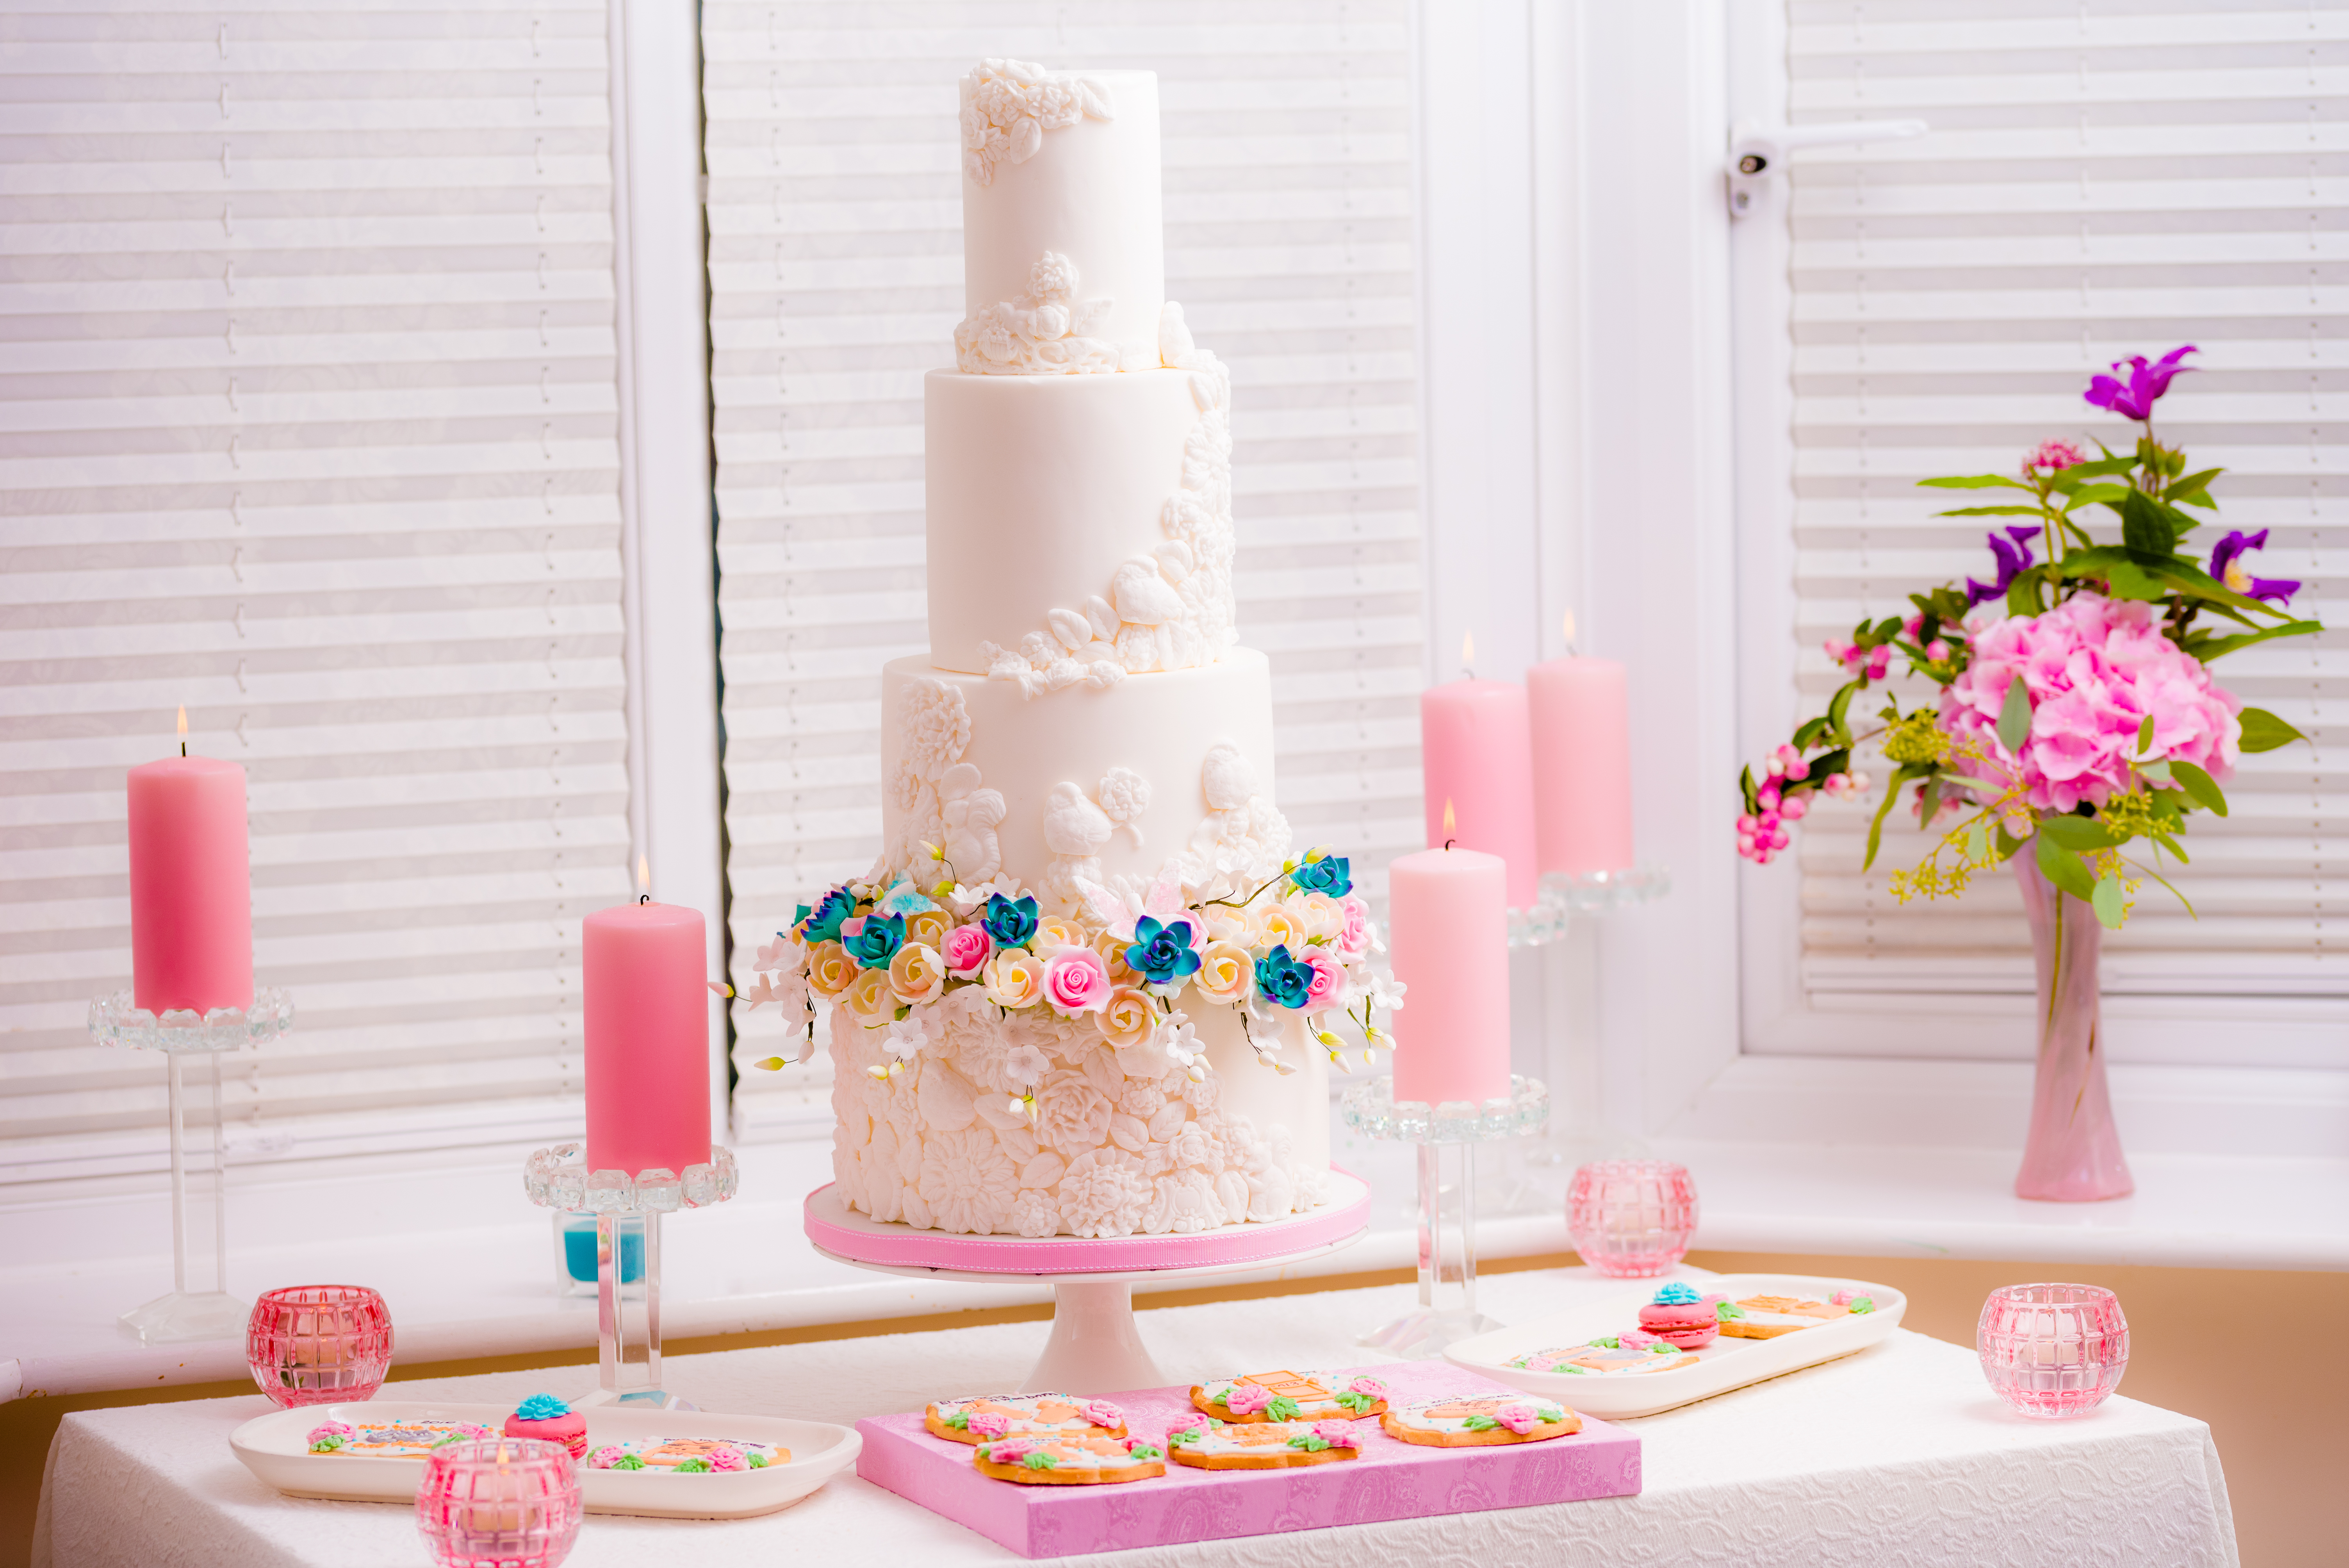 Tees Bakery   Luxury Wedding Cakes on Feedspot - Rss Feed